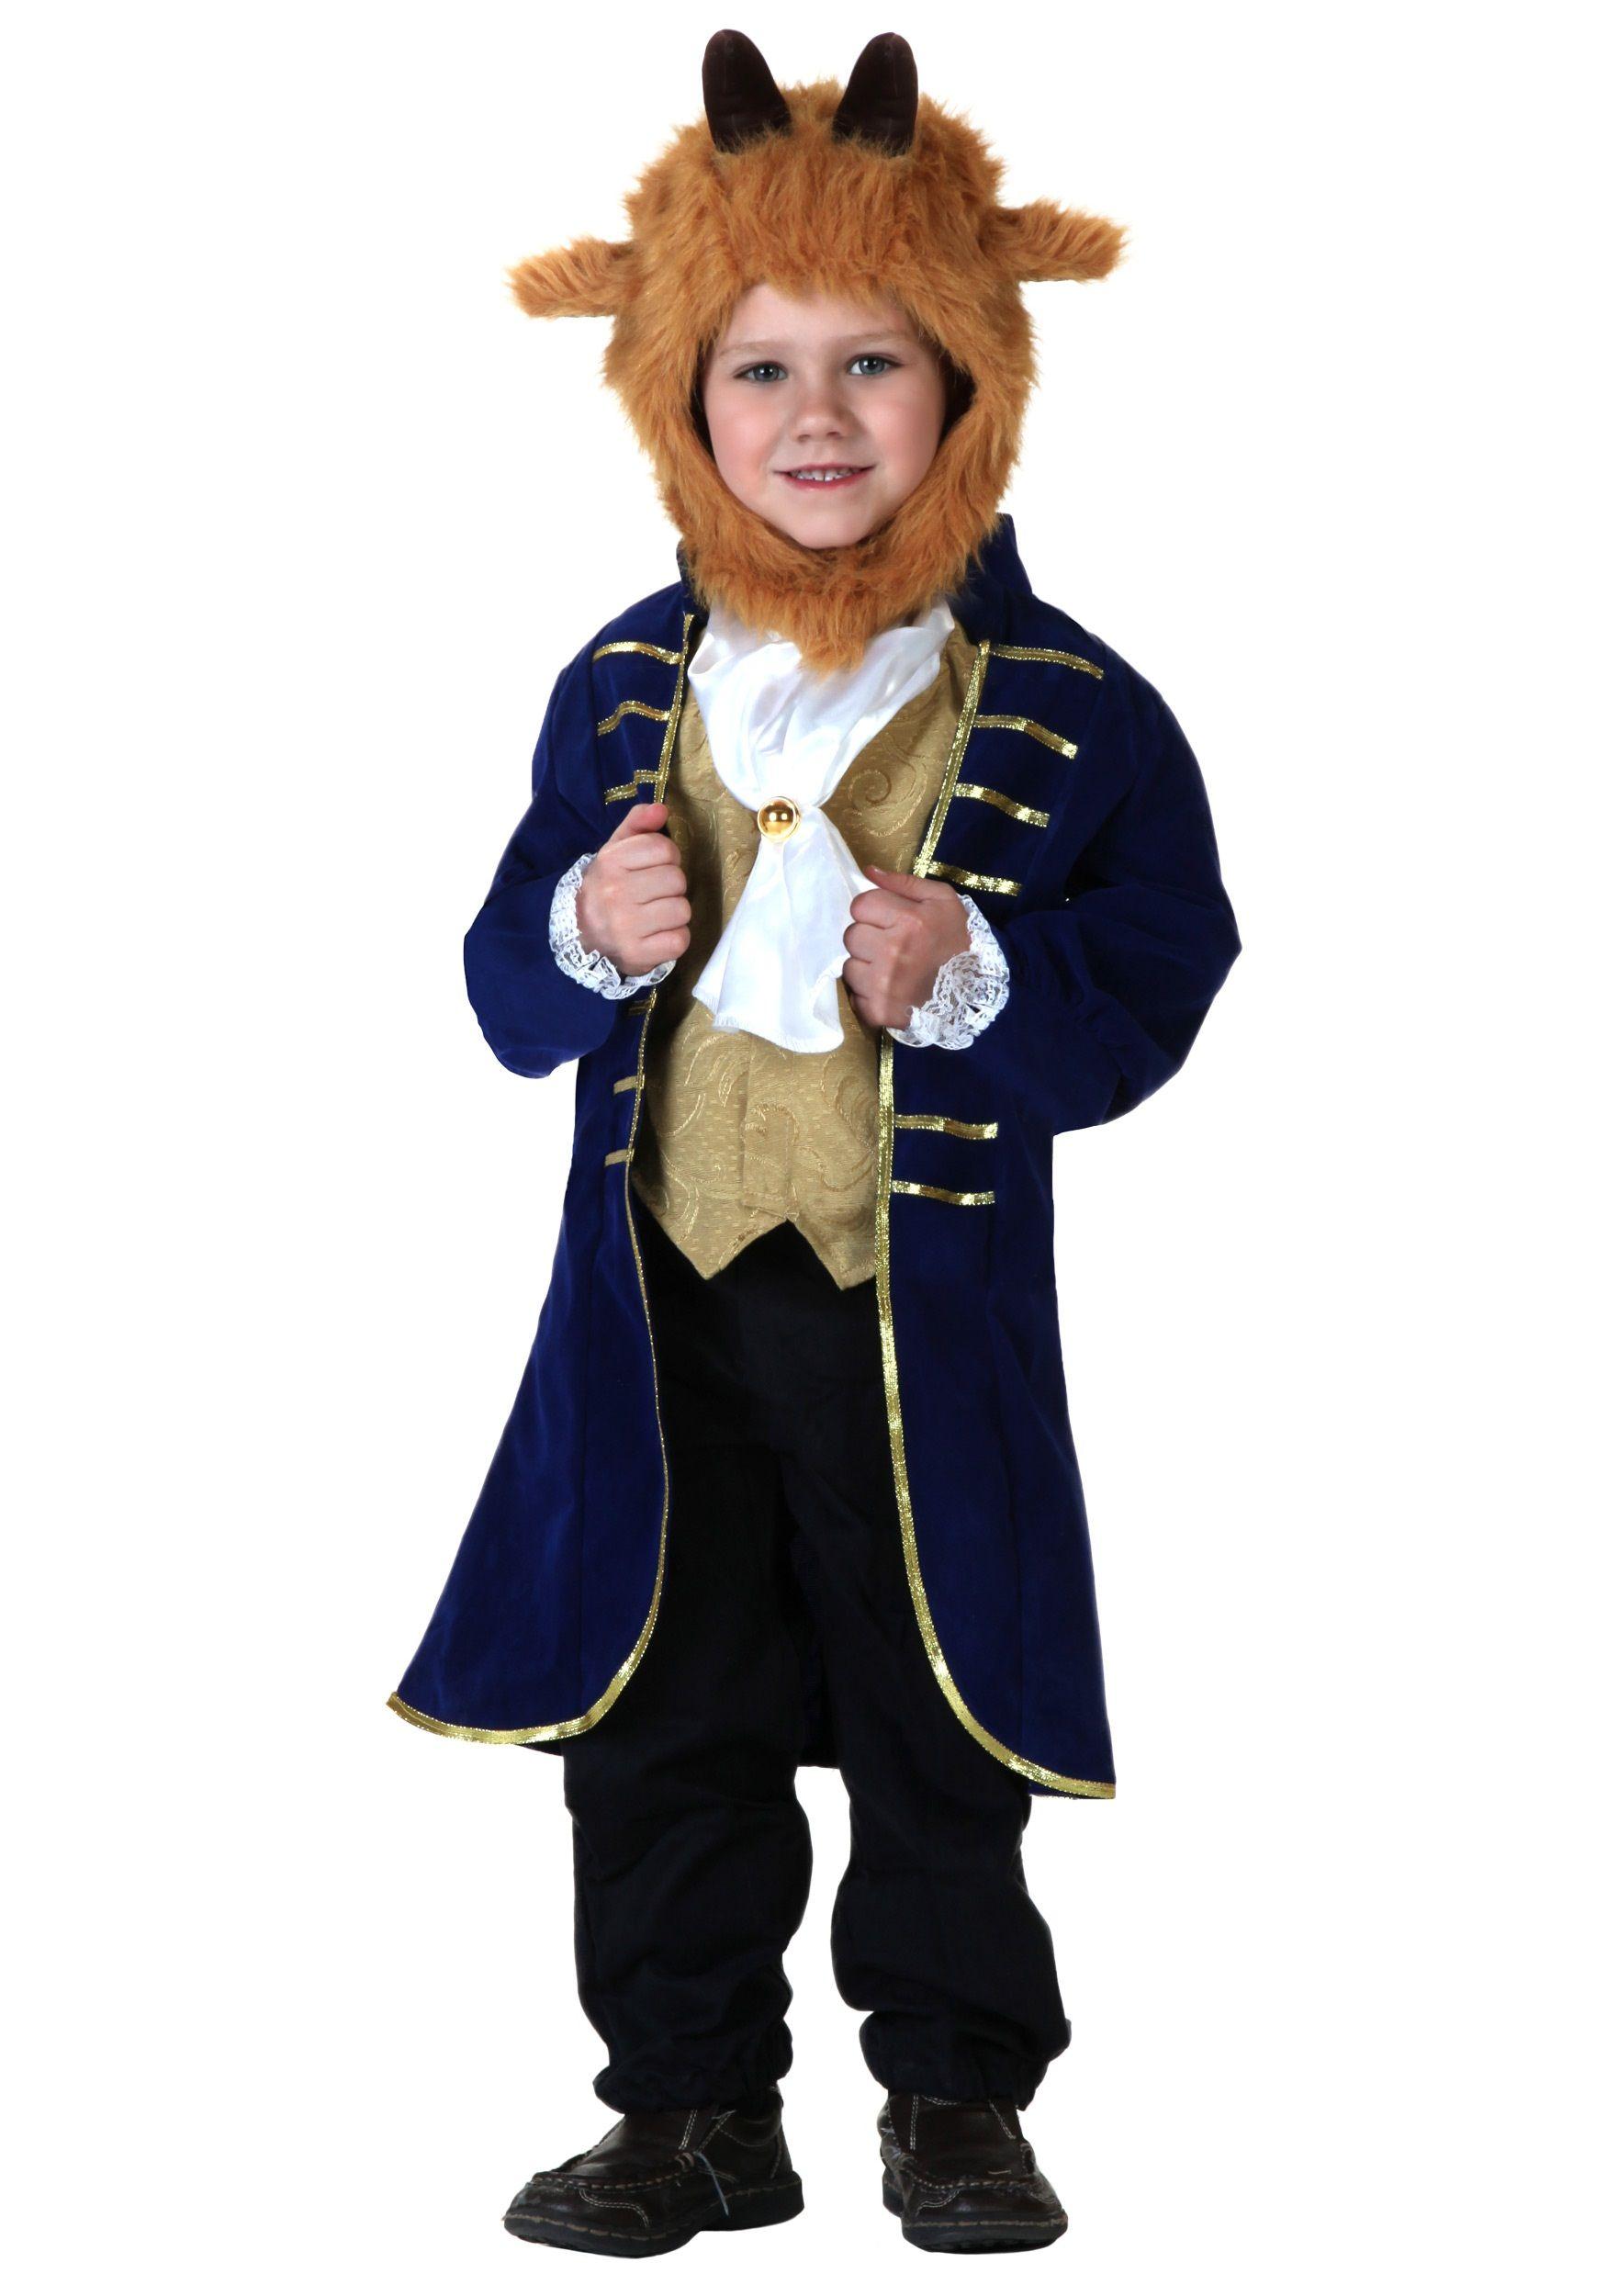 Toddler Beast Costume | Boys Halloween Costumes | Pinterest ...